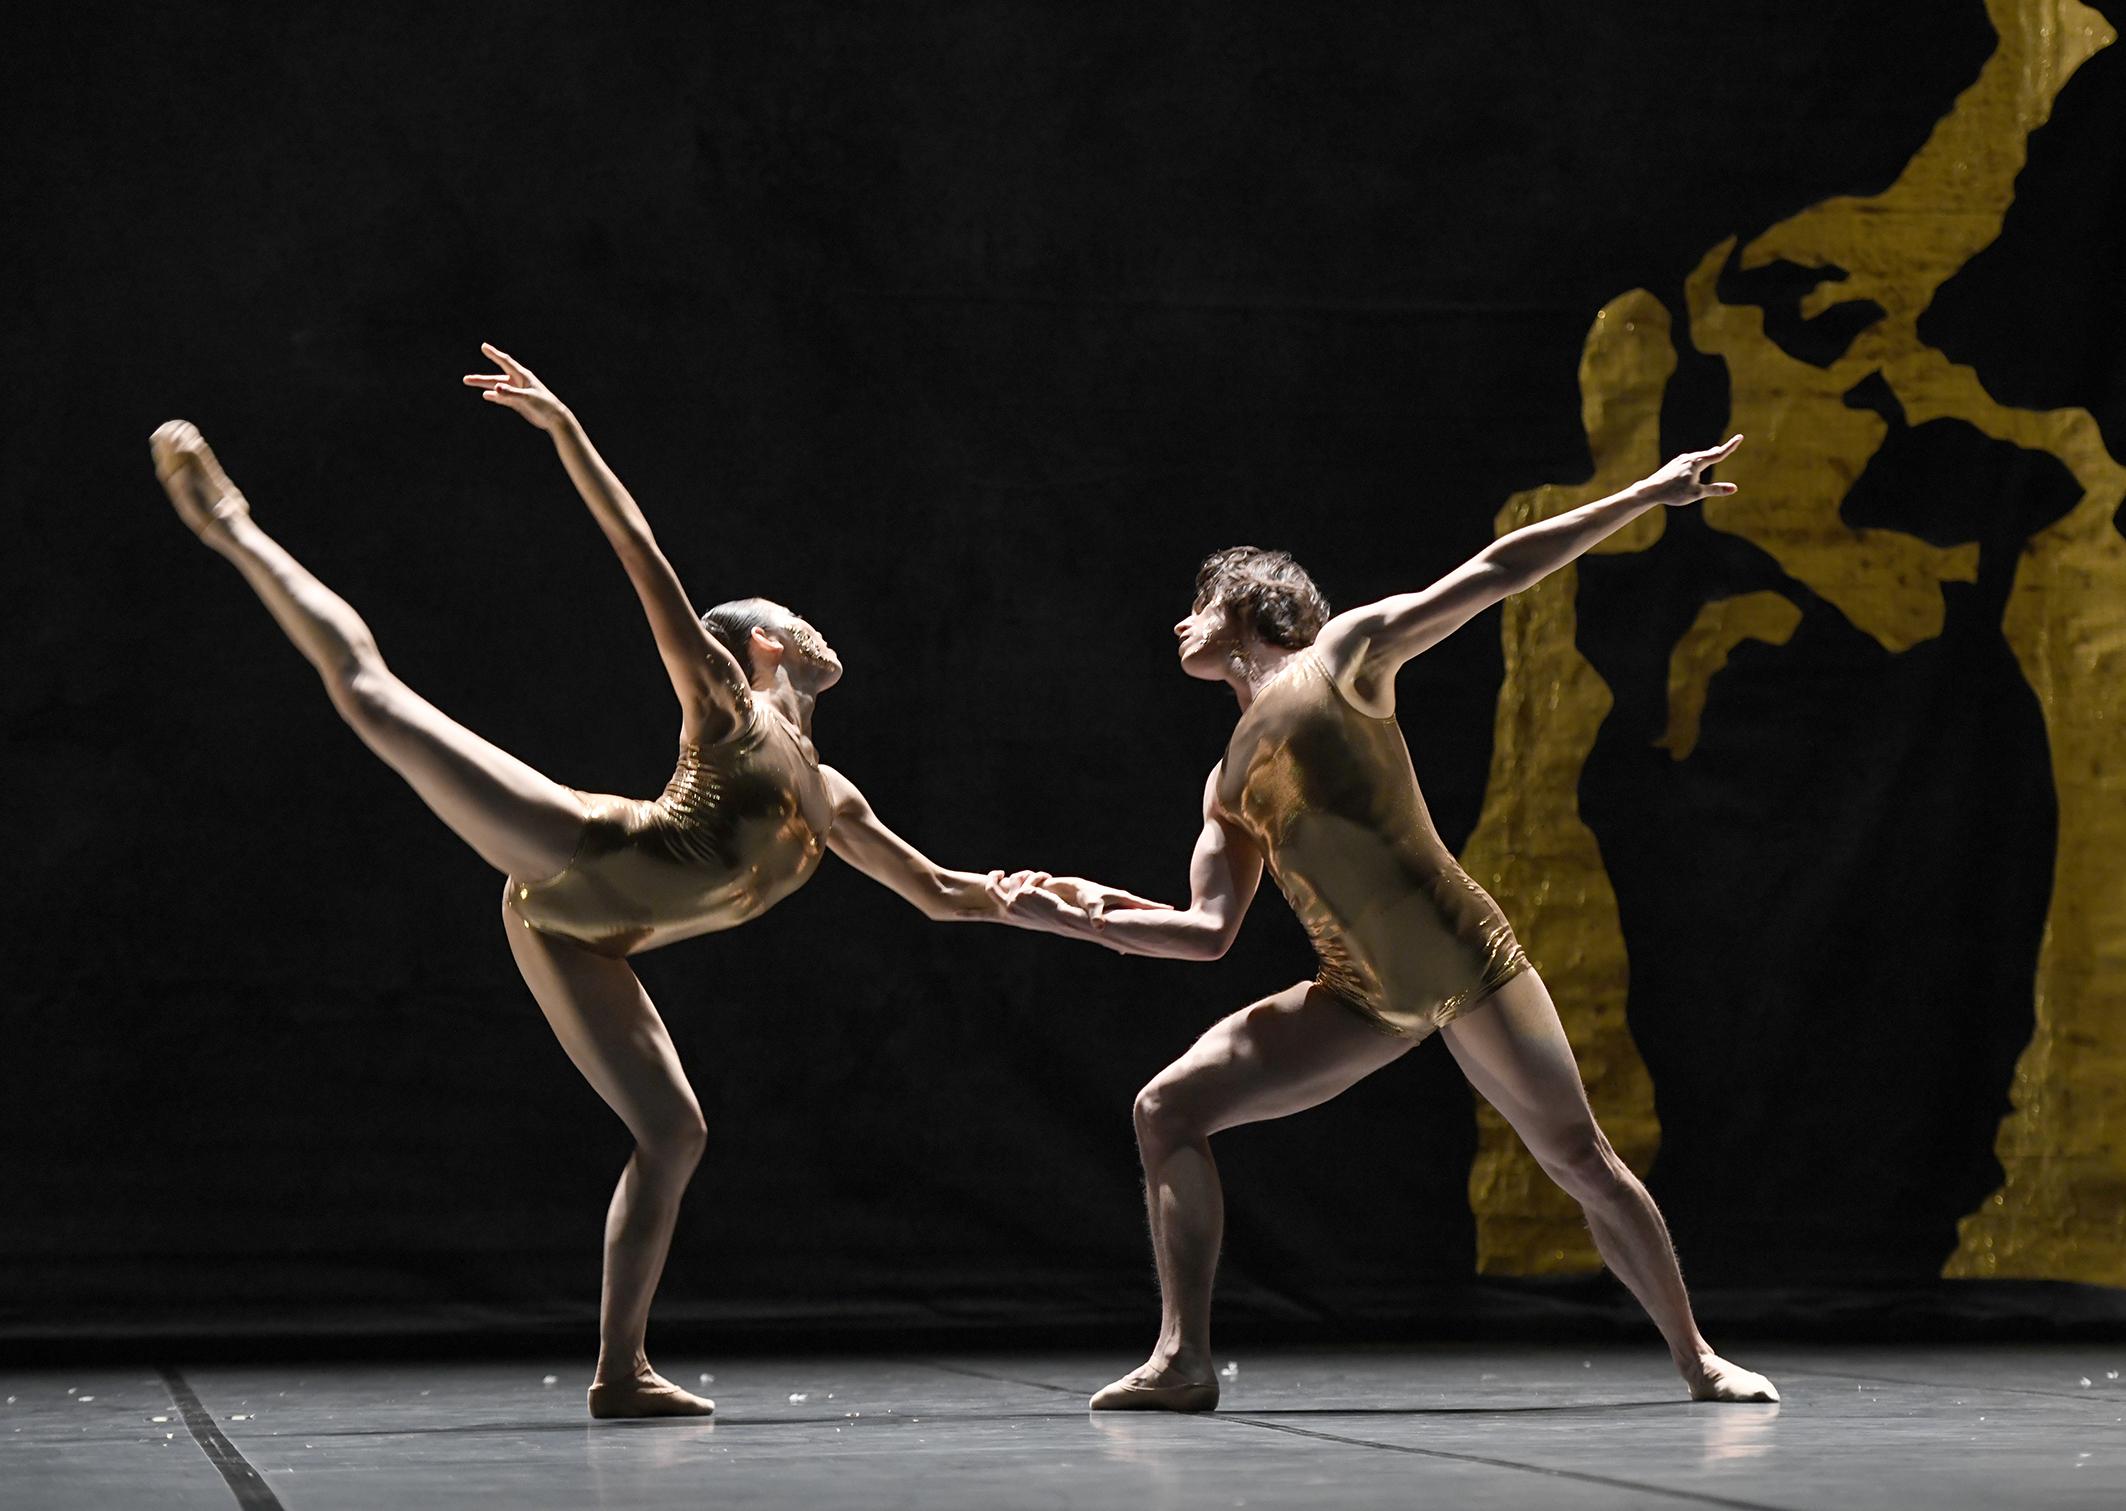 Photo Credits:  KINTSUKUROI - for Ballett Dortmund  Choreography : Wubkje Kuindersma  Photographer: Bettine Stoß  Dancers Ballett Dortmund : Sae Tamura, Javier Aleman